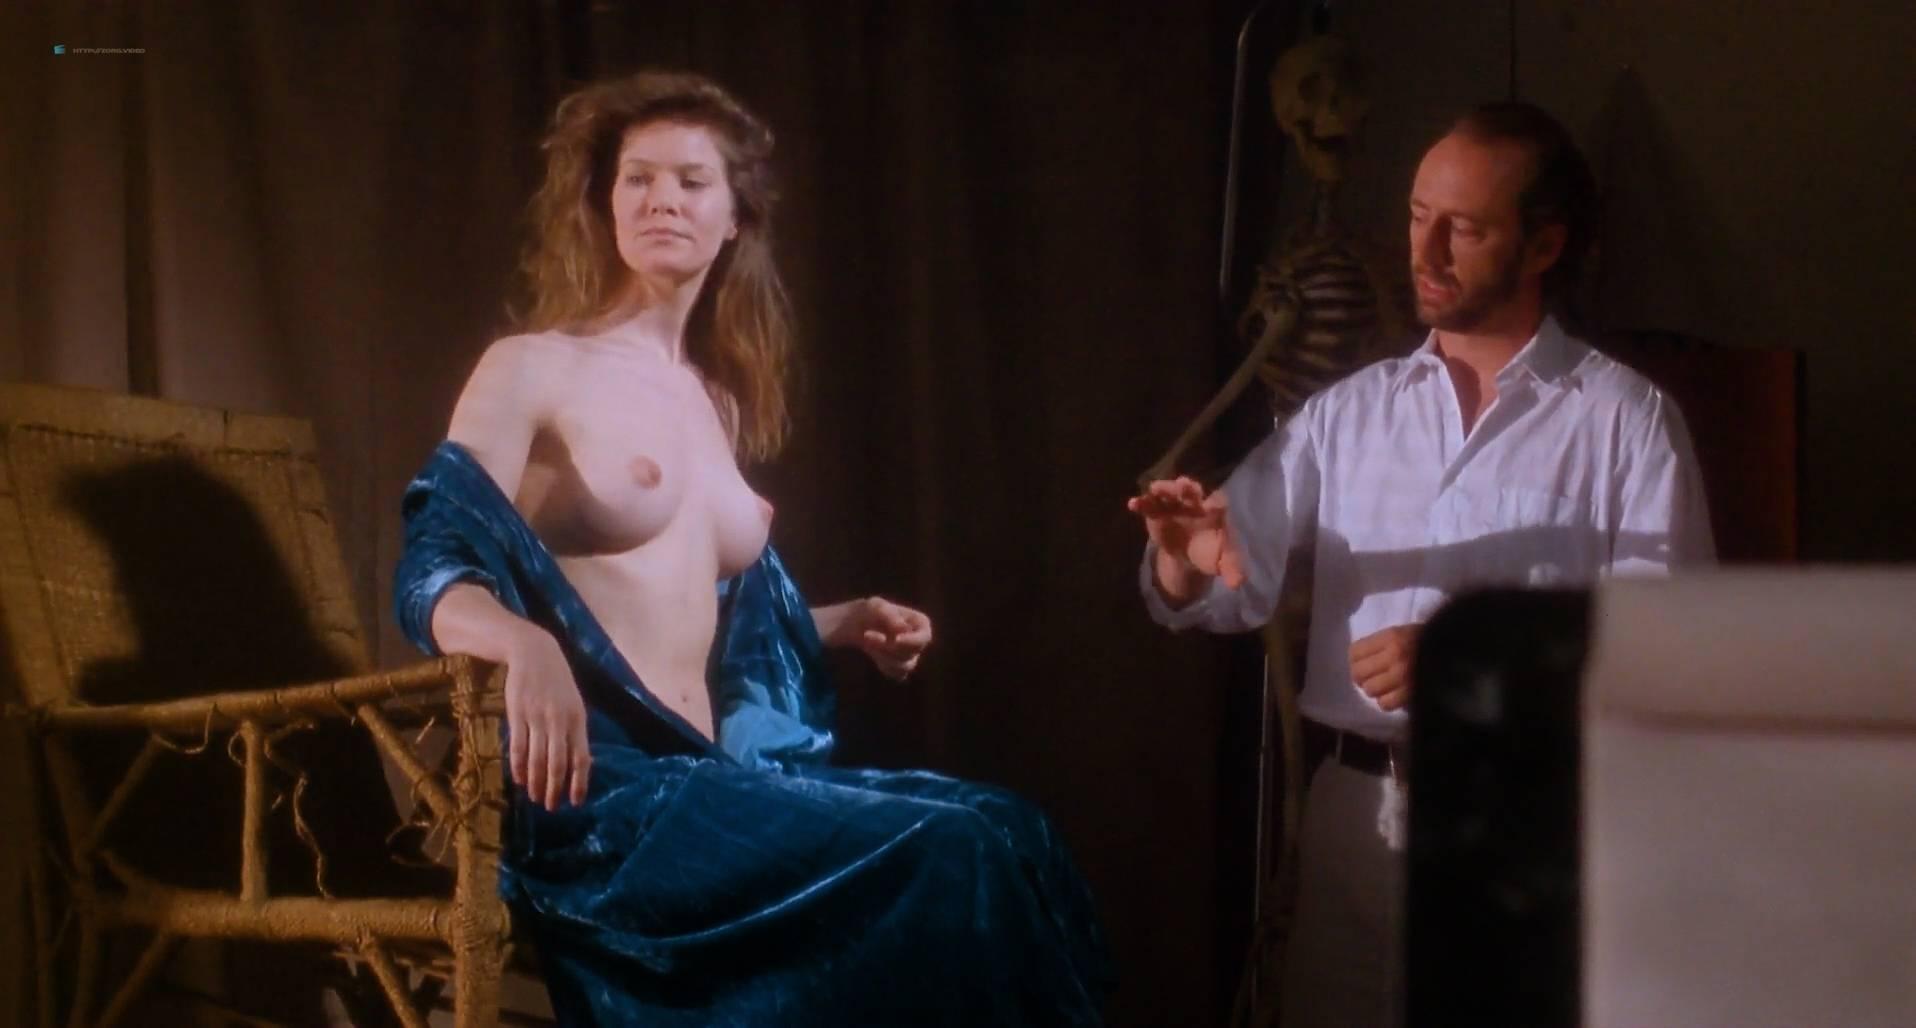 face-public-alyssa-milano-topless-poison-ivy-lesbian-sex-pics